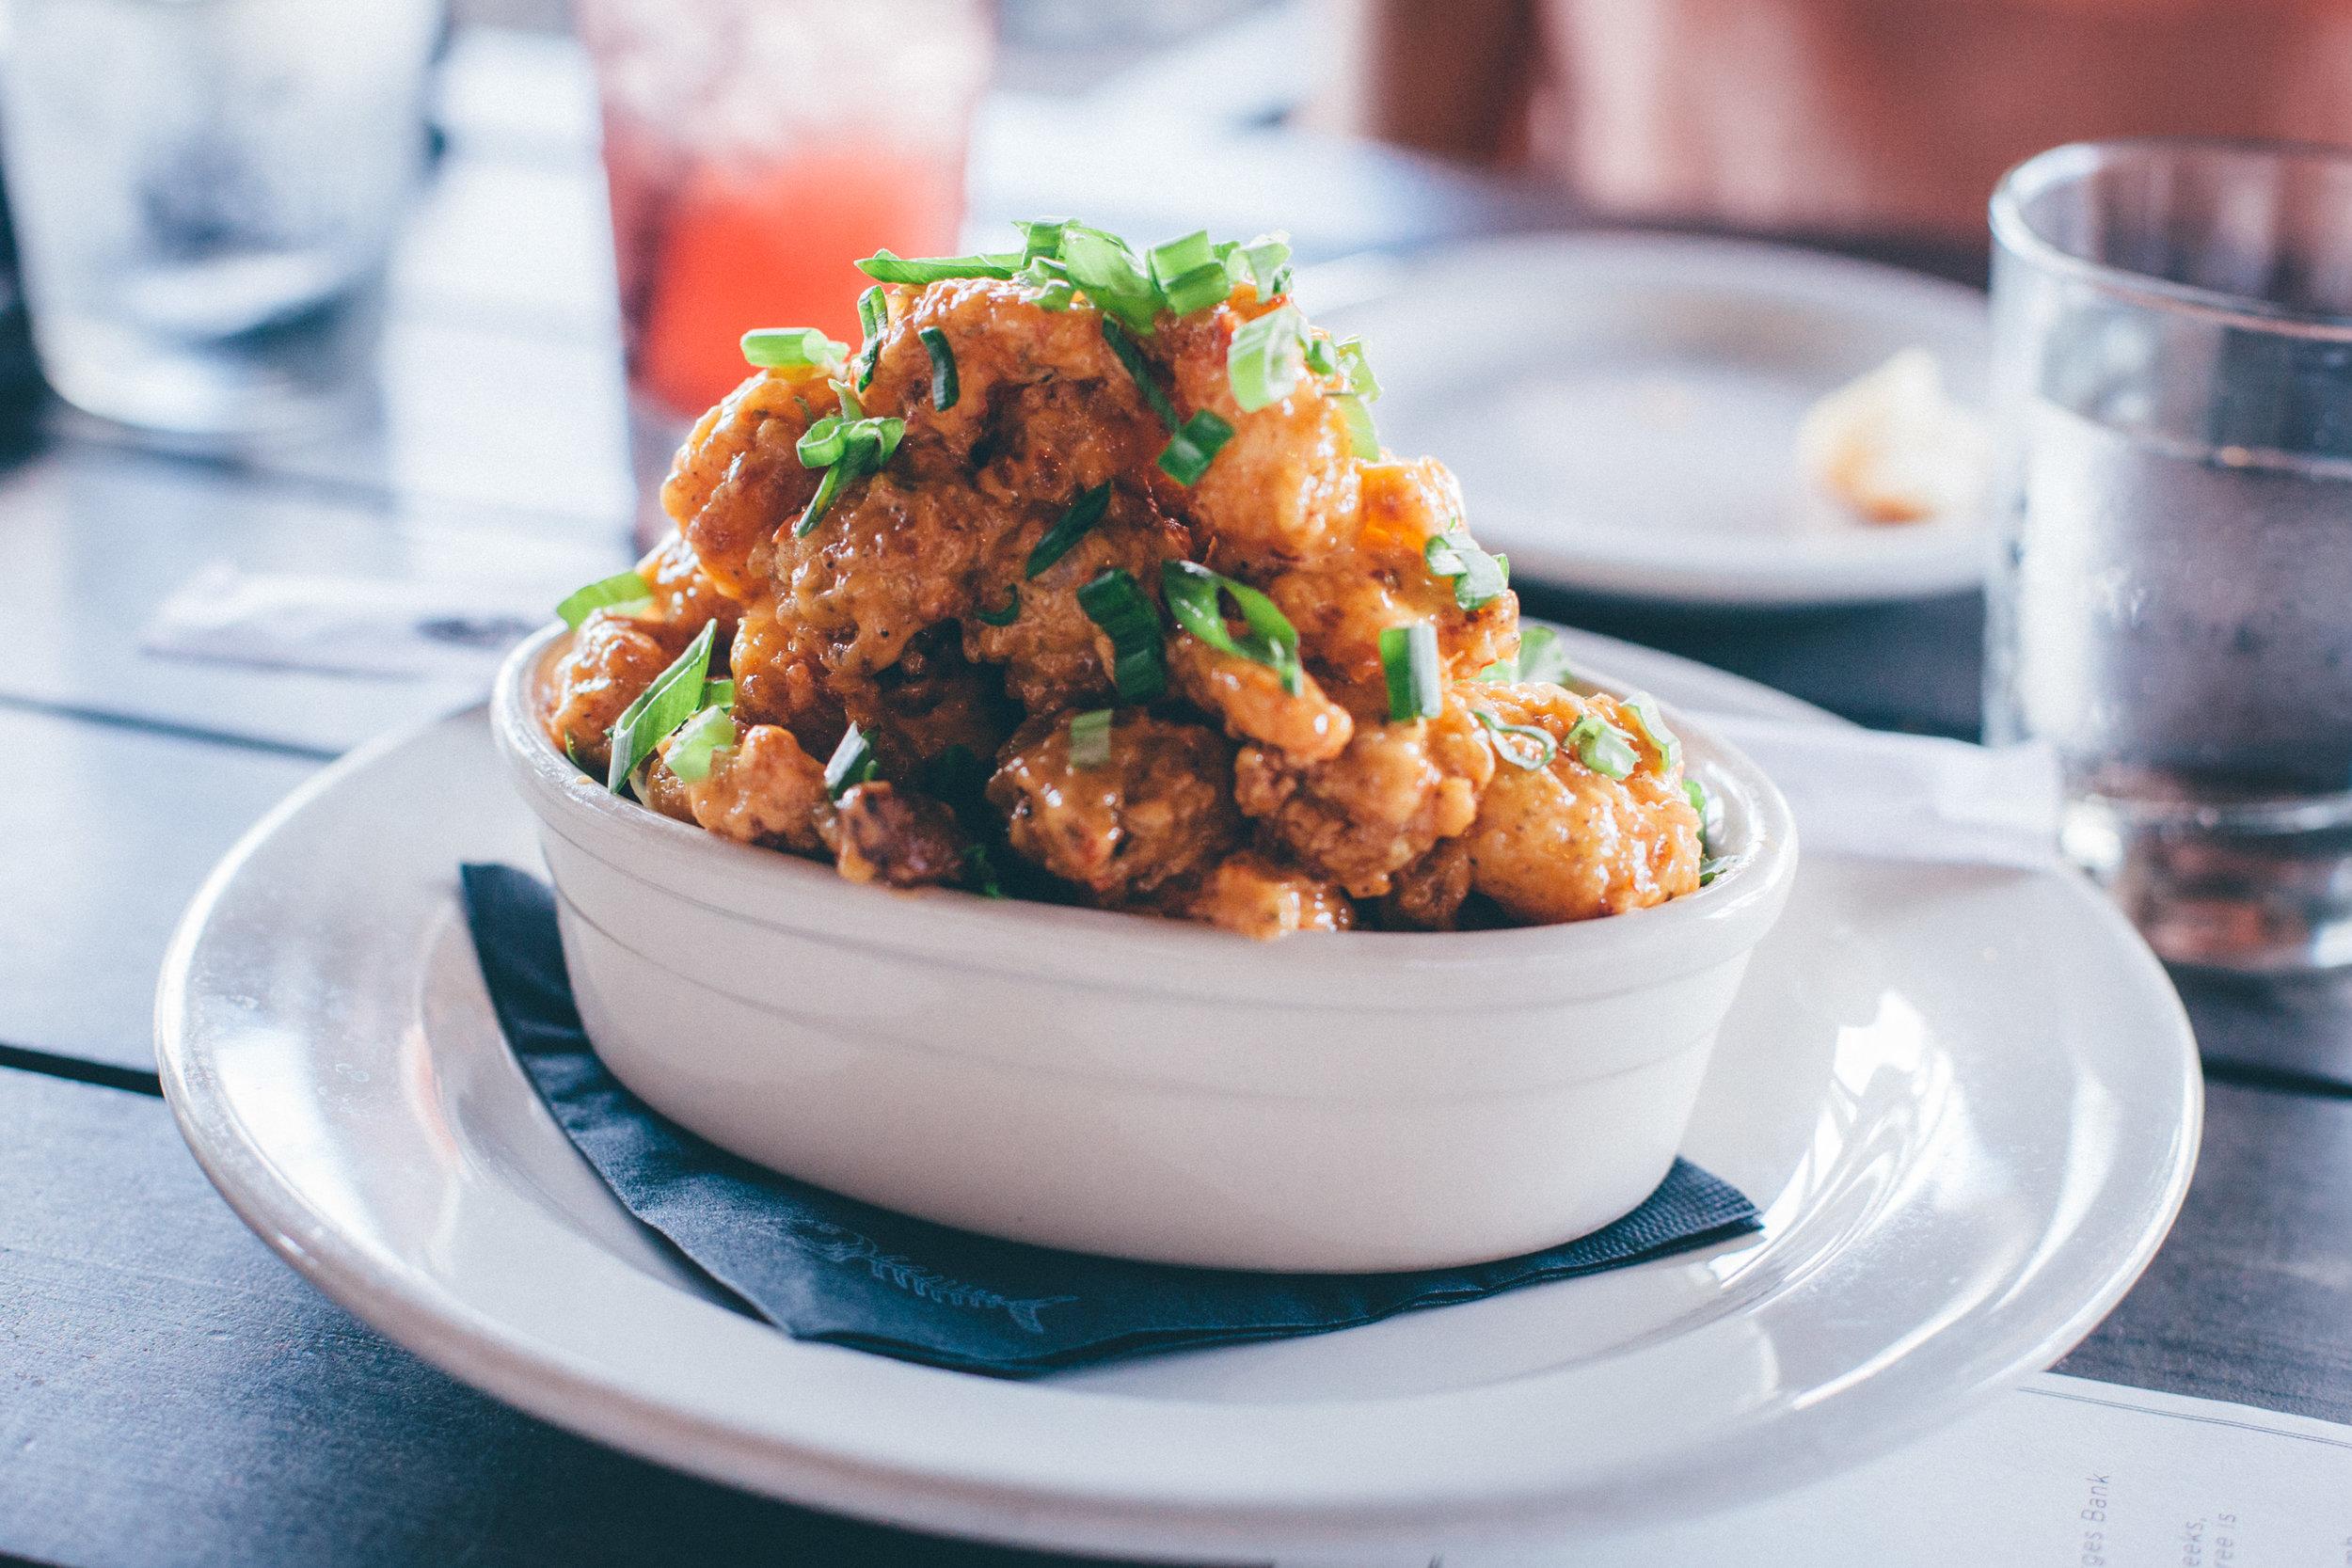 Bang Bang Shrimp: Crispy shrimp, tossed in Bonefish Grill's signature creamy, spicy sauce.